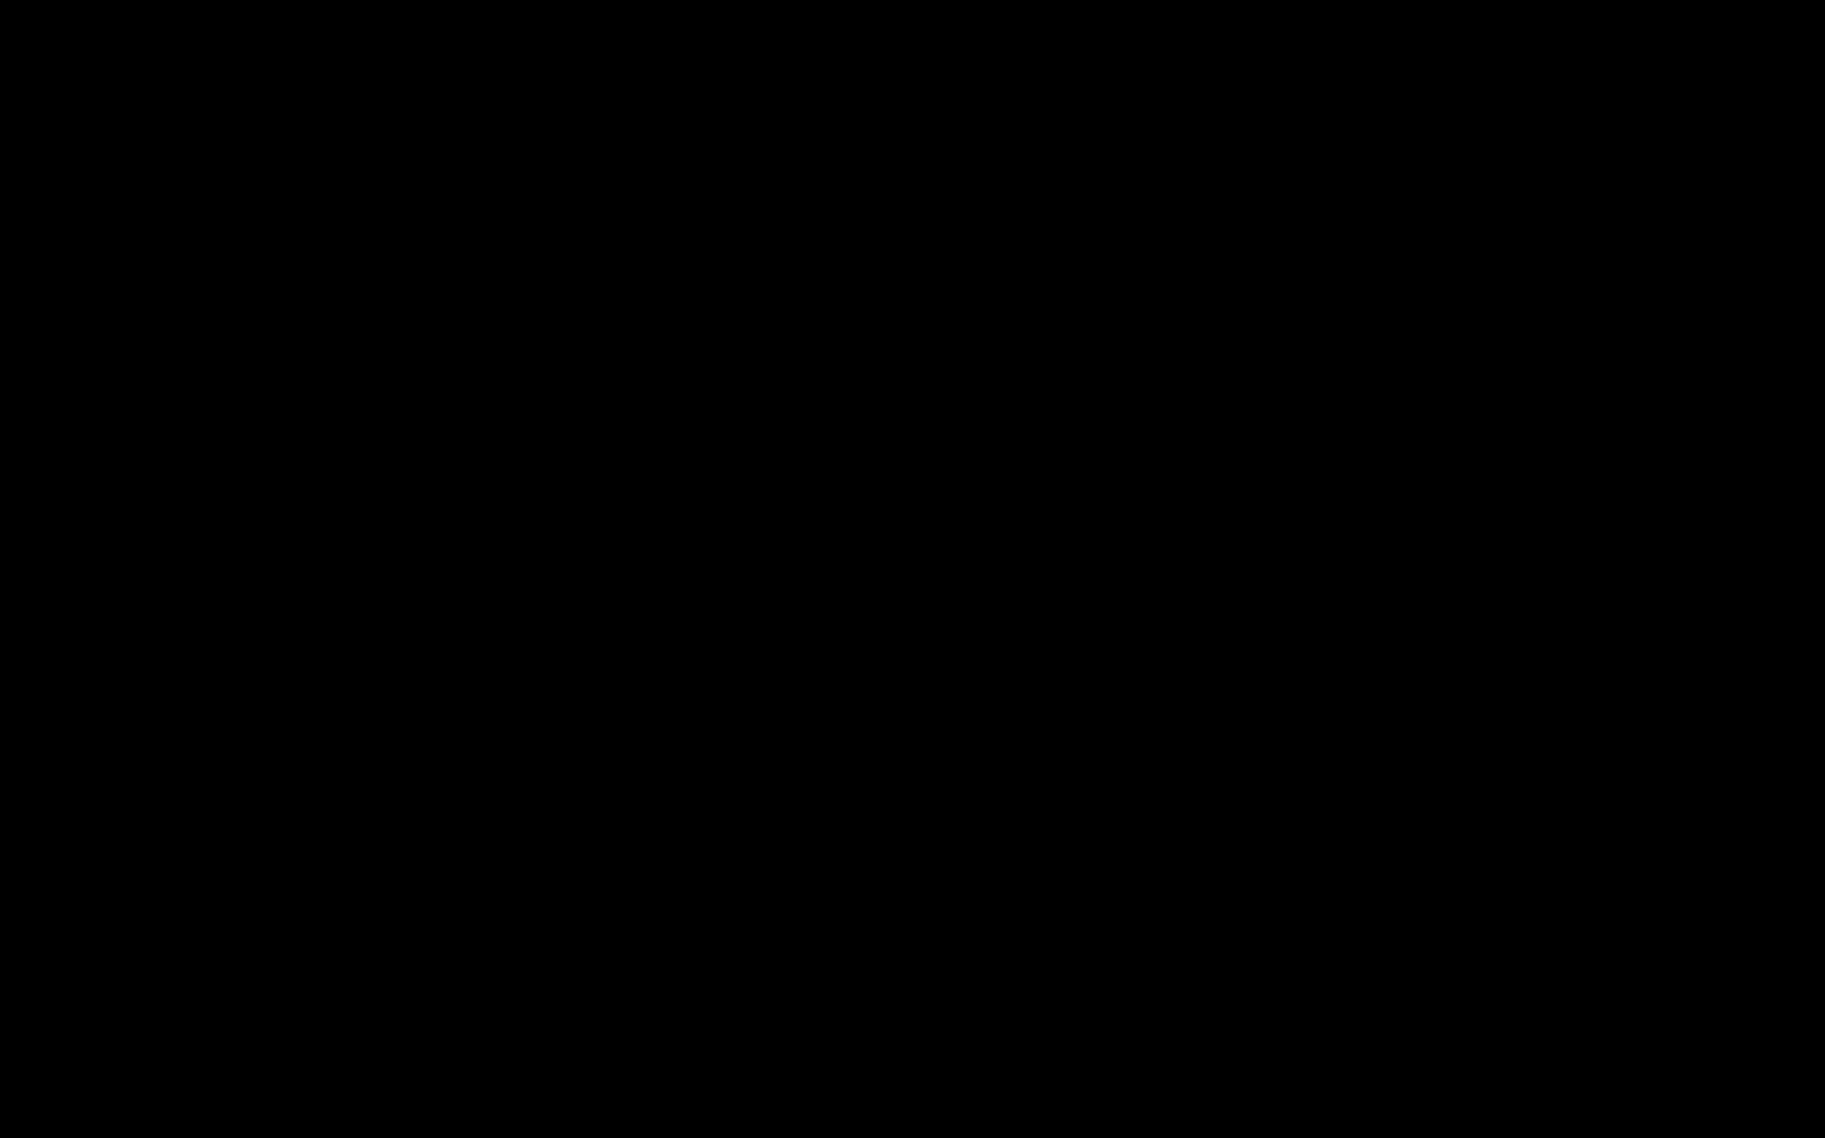 Logo Header Menu Frase De Familia Em Png Clipart Full